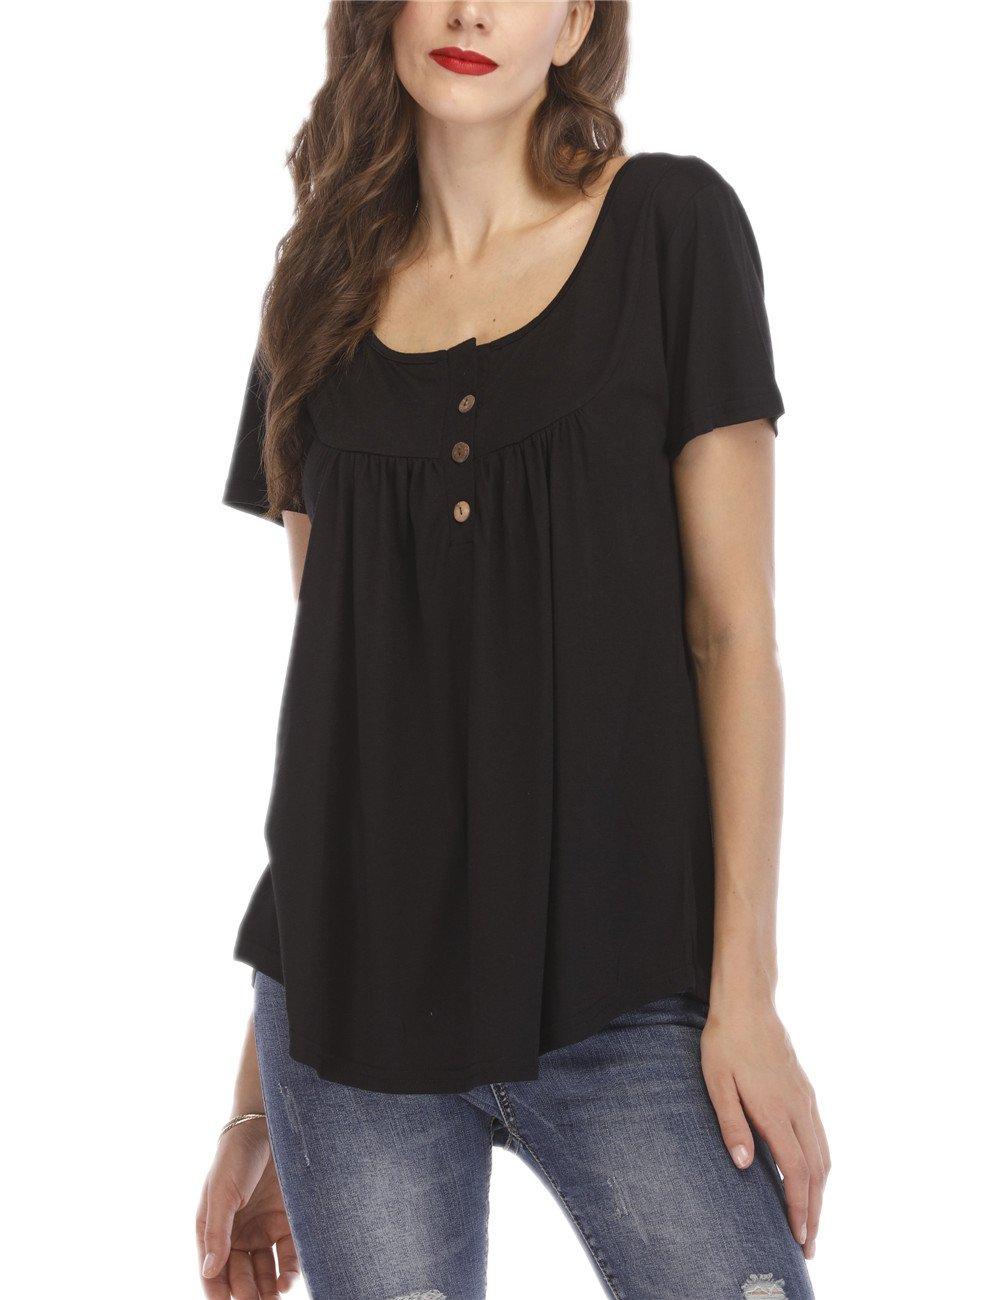 KSK KAISHEK Womens Casual Cotton Short Sleeve Basic Baggy Plain Blouse T shirt